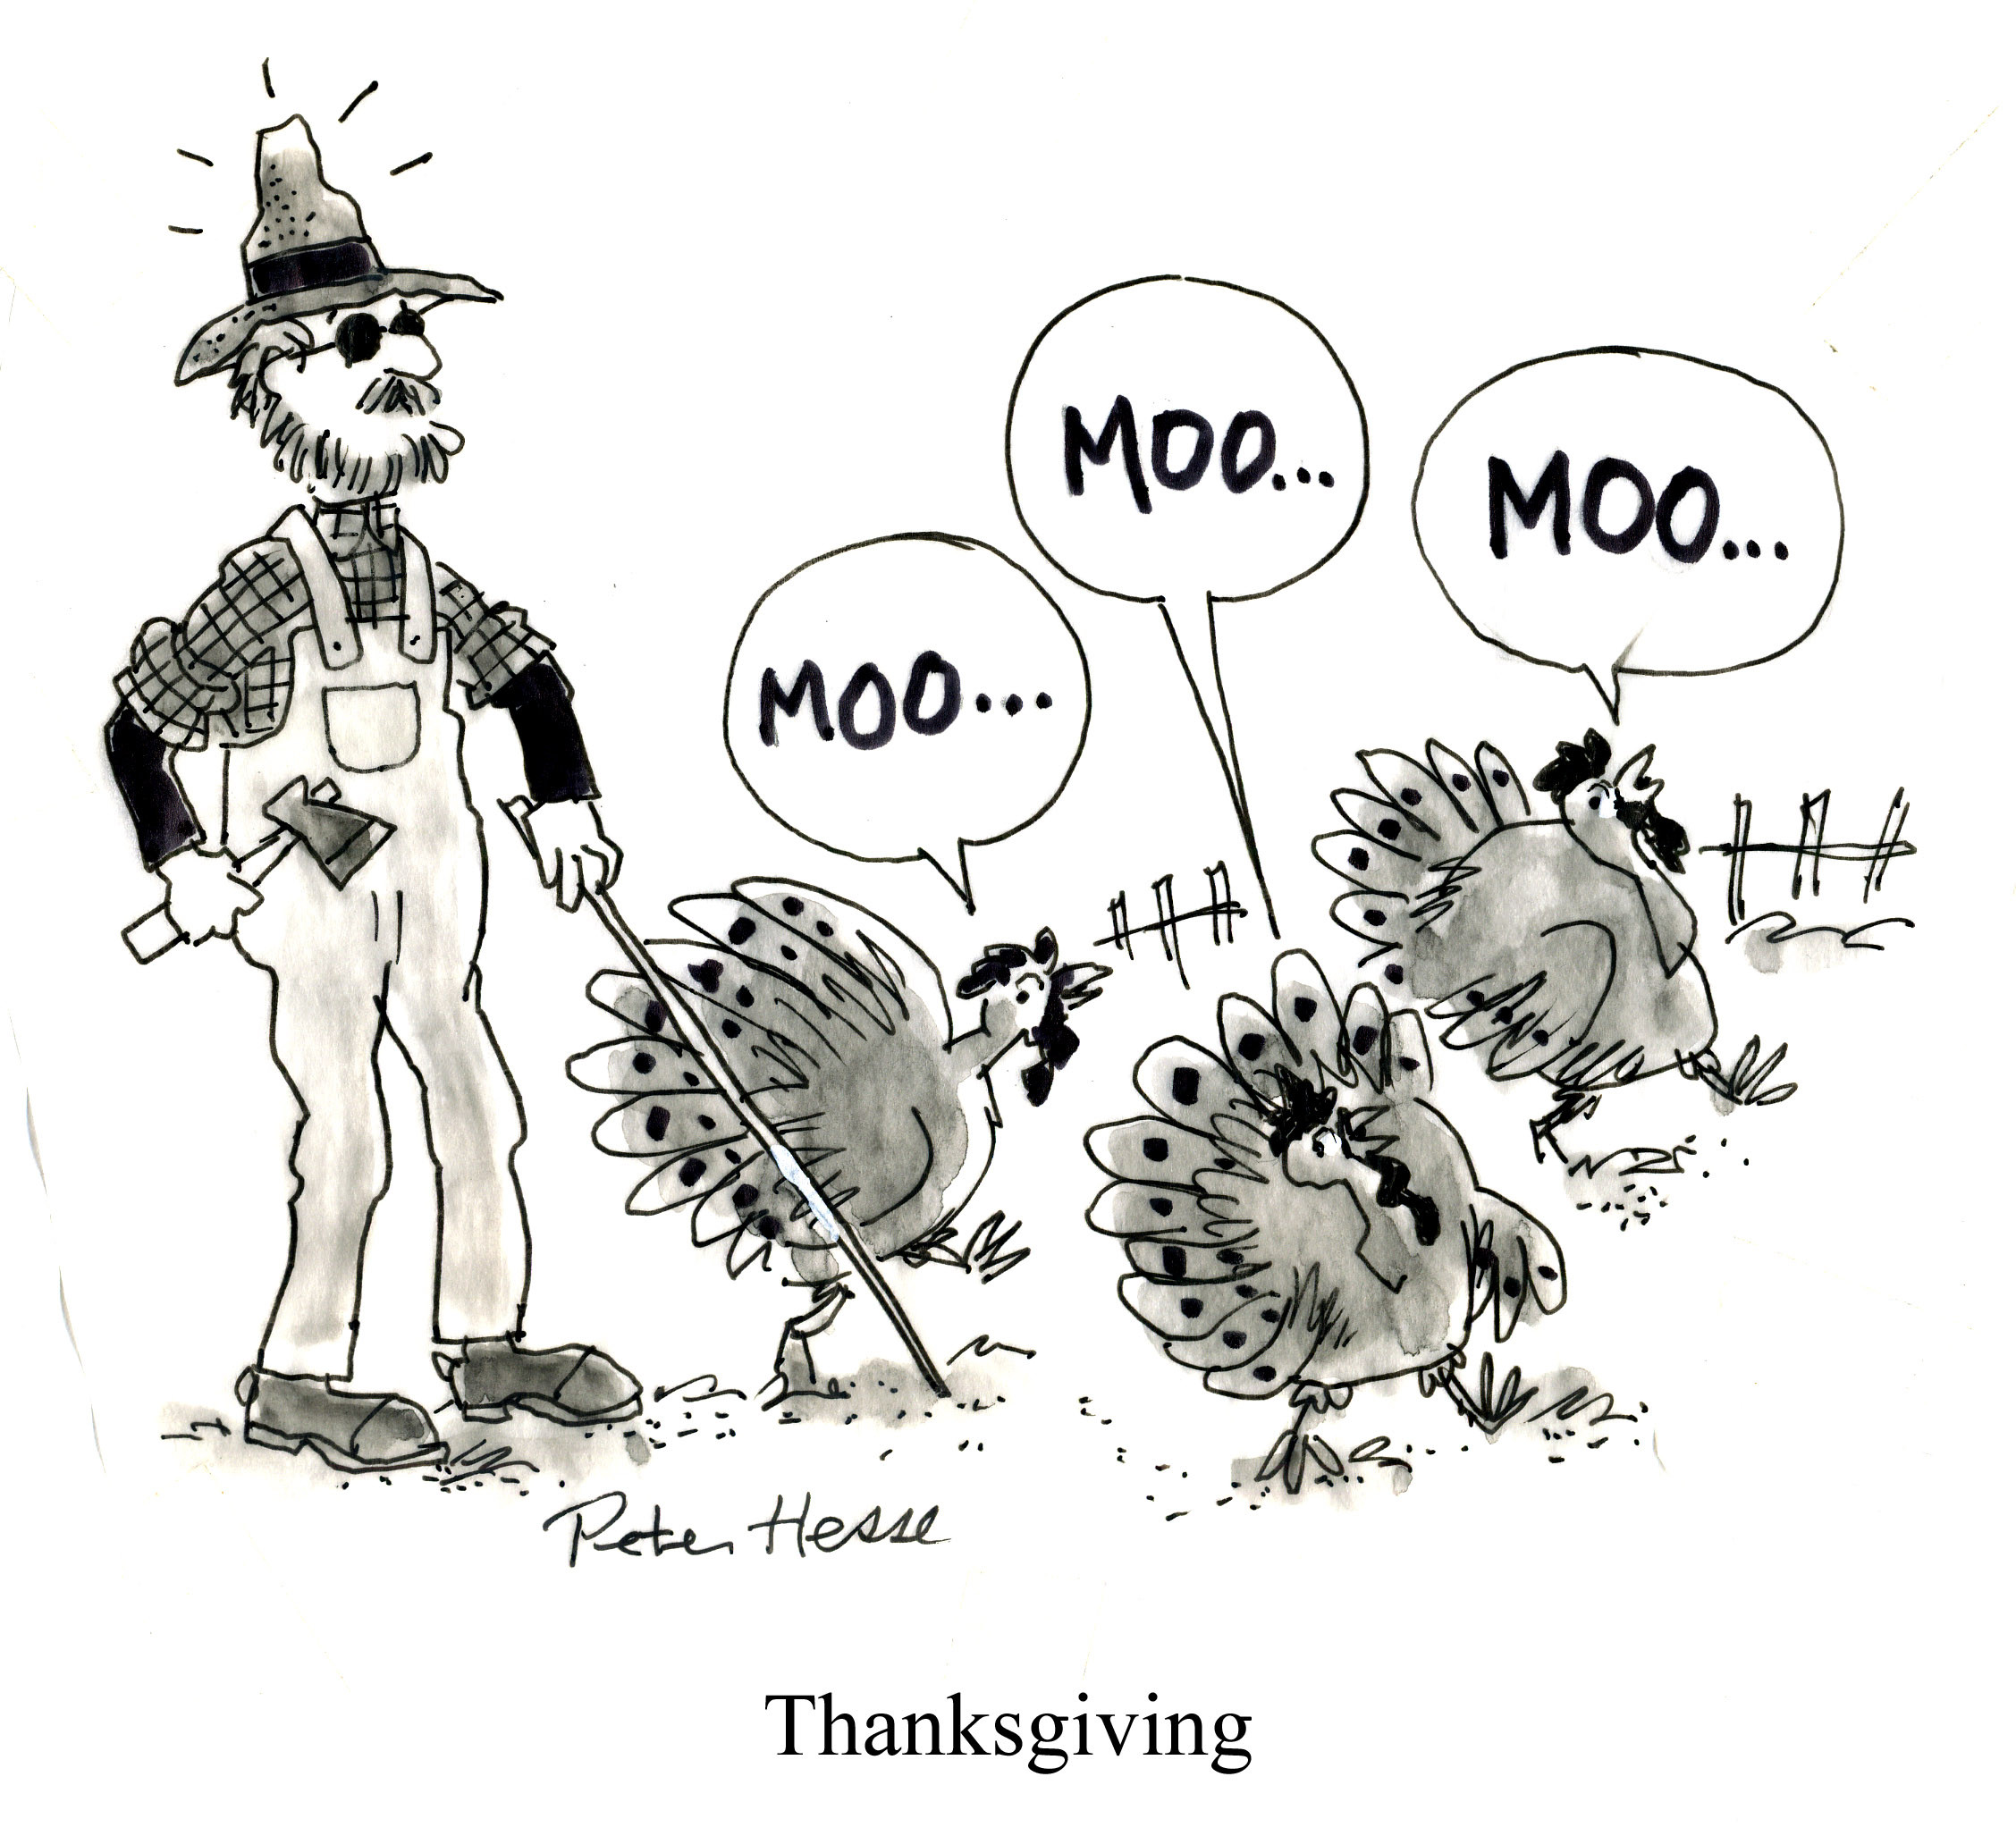 thanksgiving cartoon images free